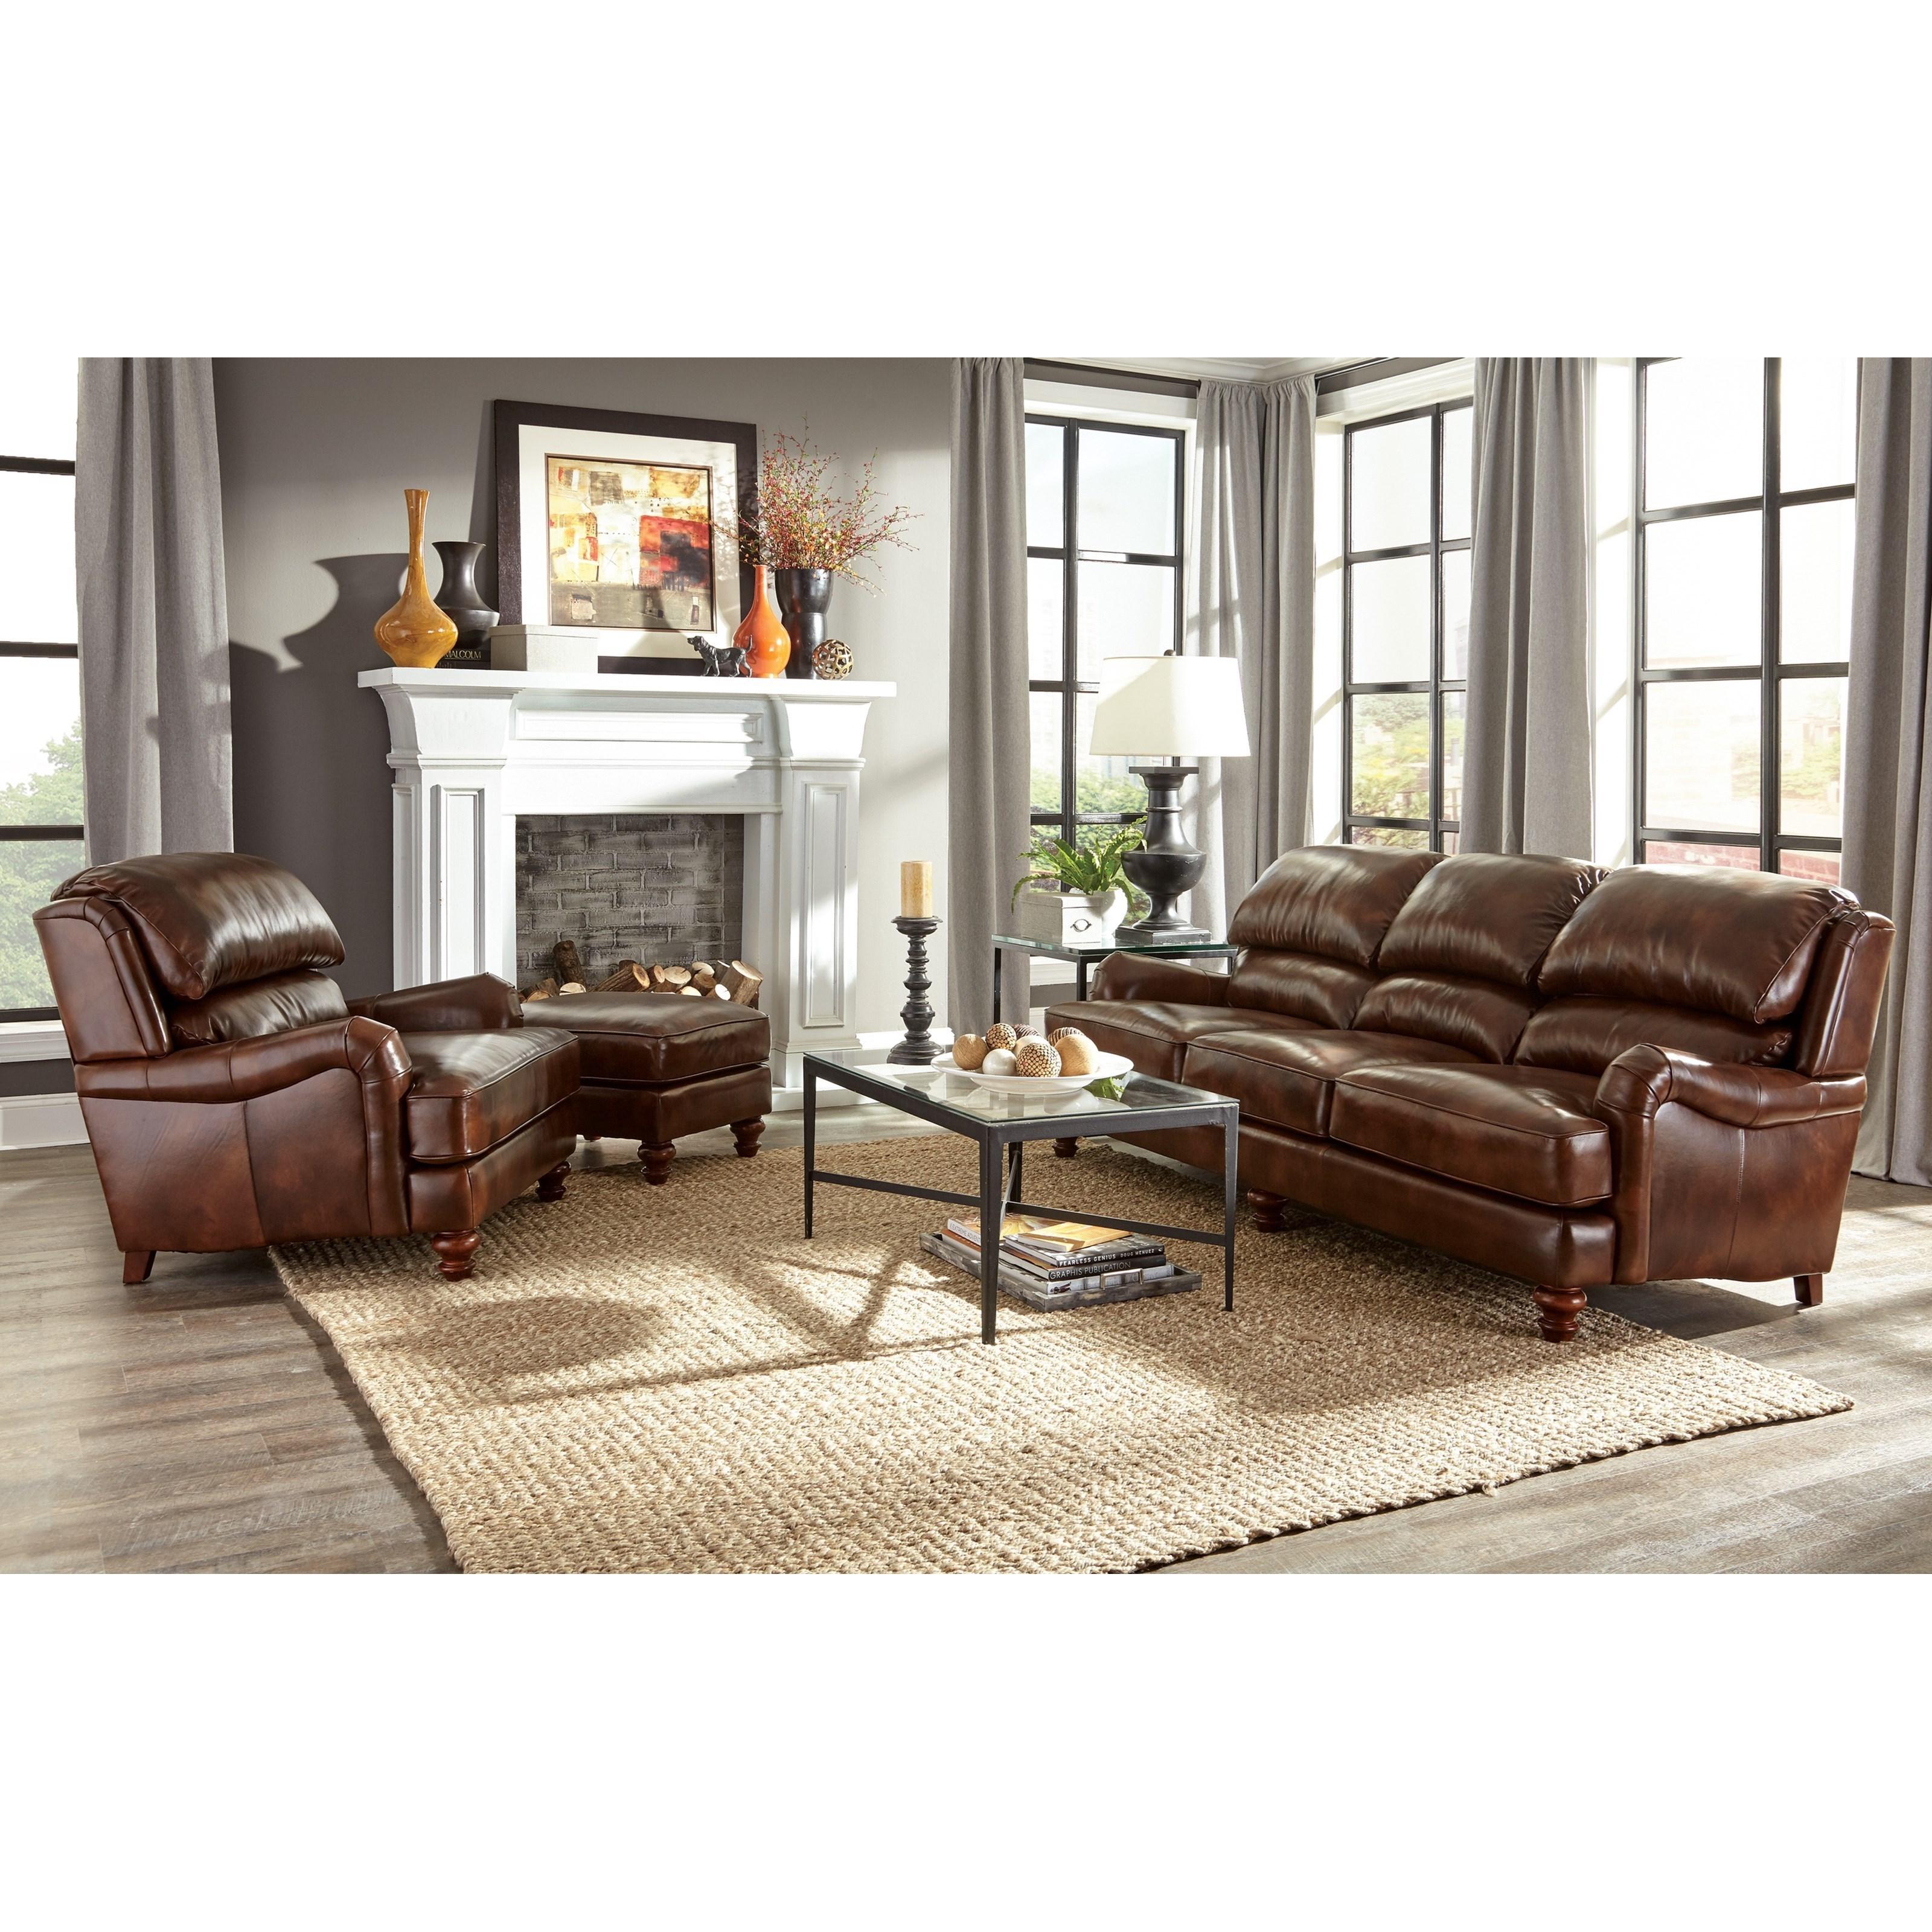 Craftmaster L162250 Living Room Group Jacksonville Furniture Mart Stationary Living Room Groups